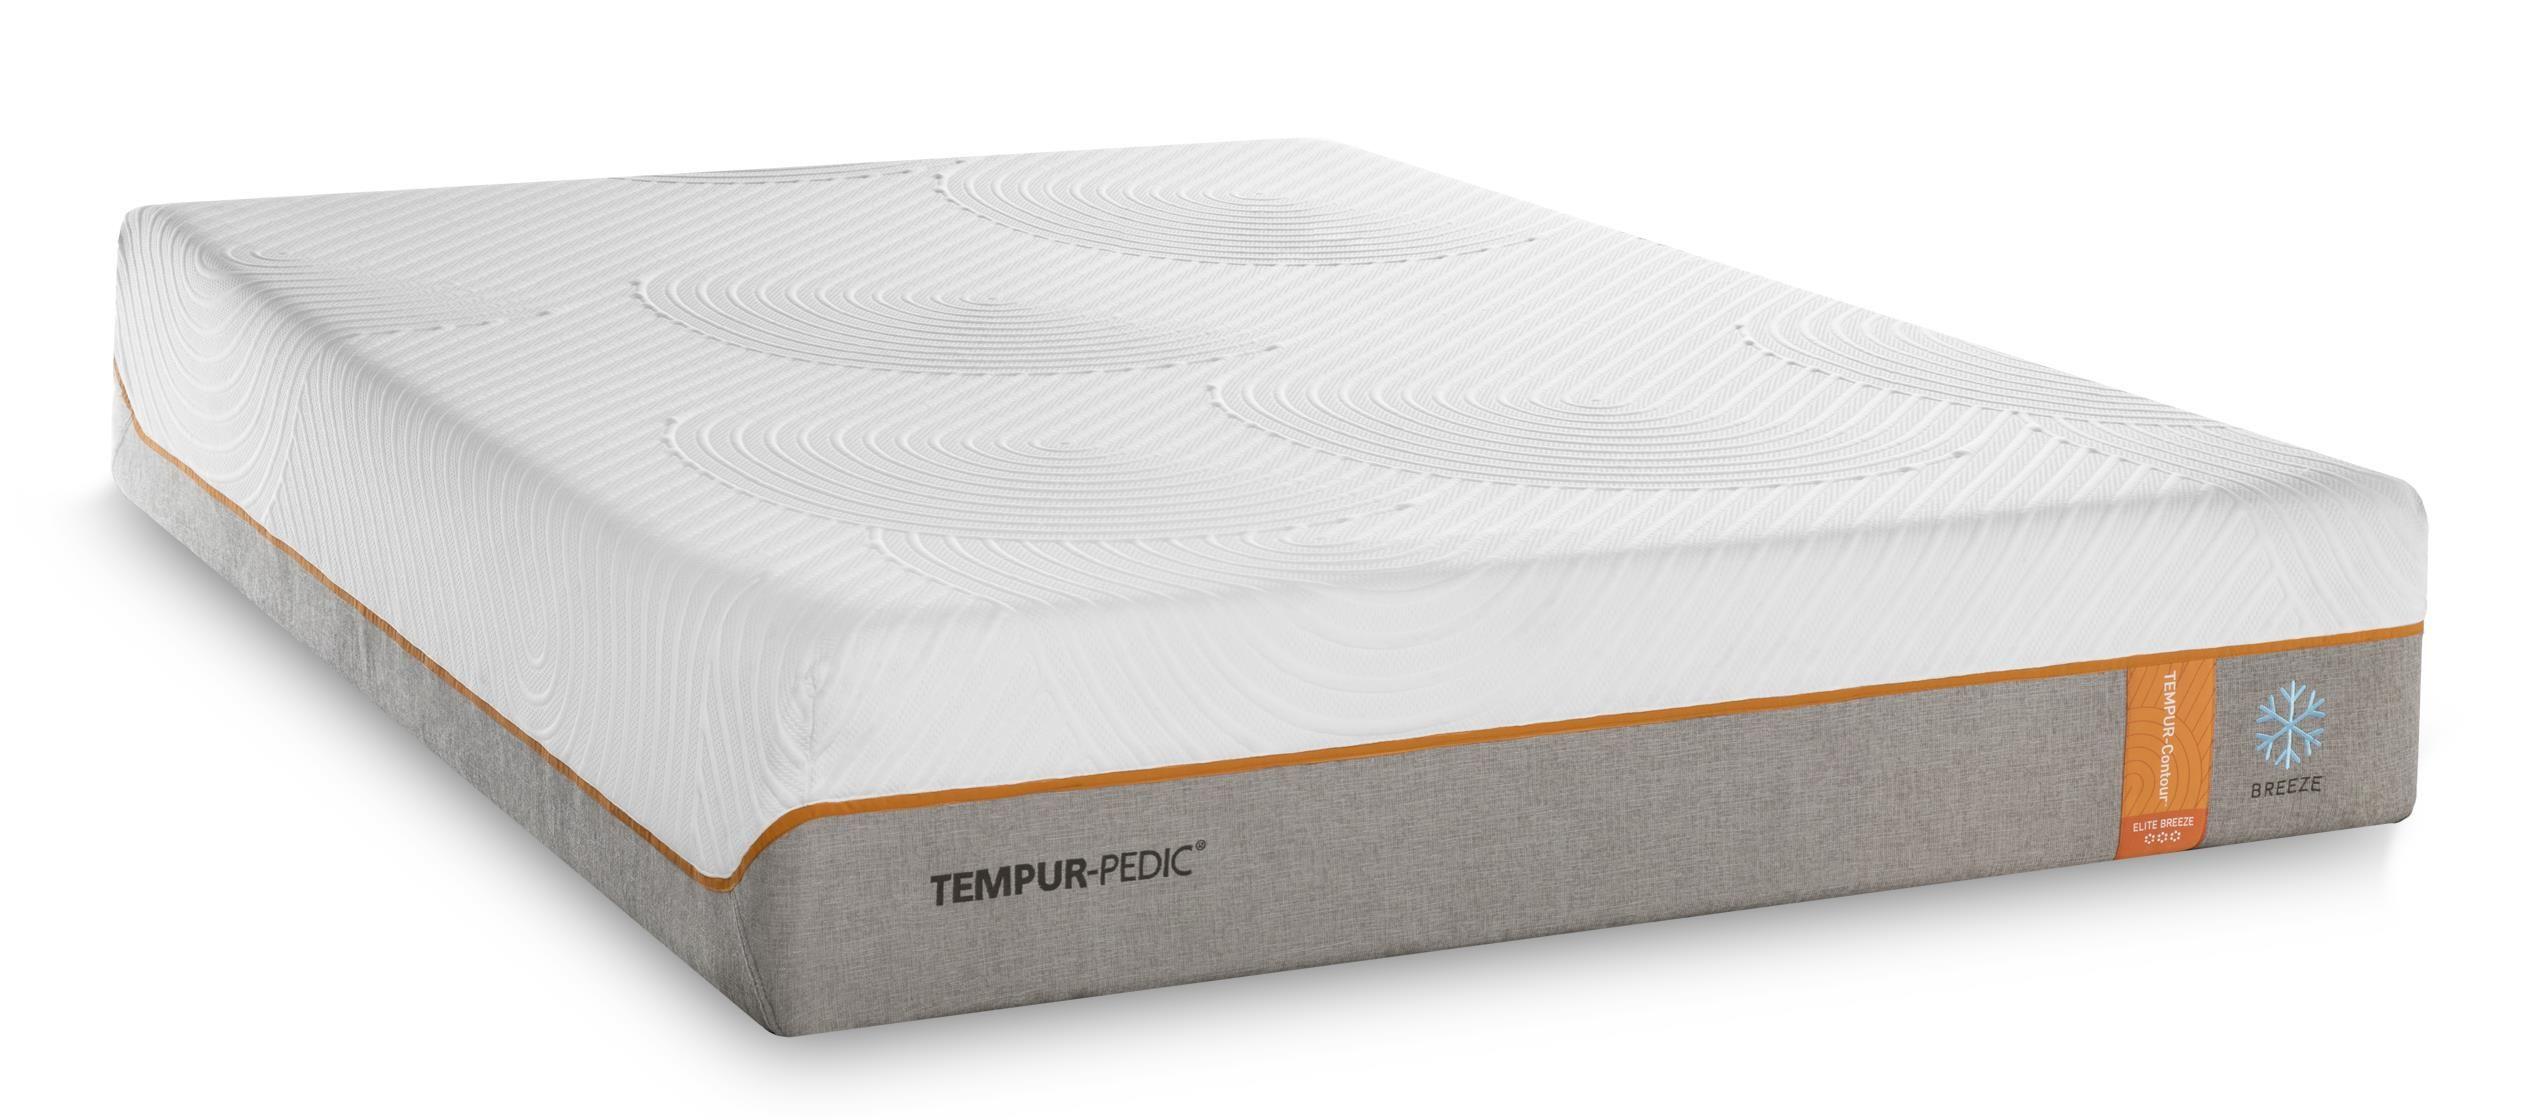 TEMPURContour Elite Breeze Queen MediumFirm Mattress by